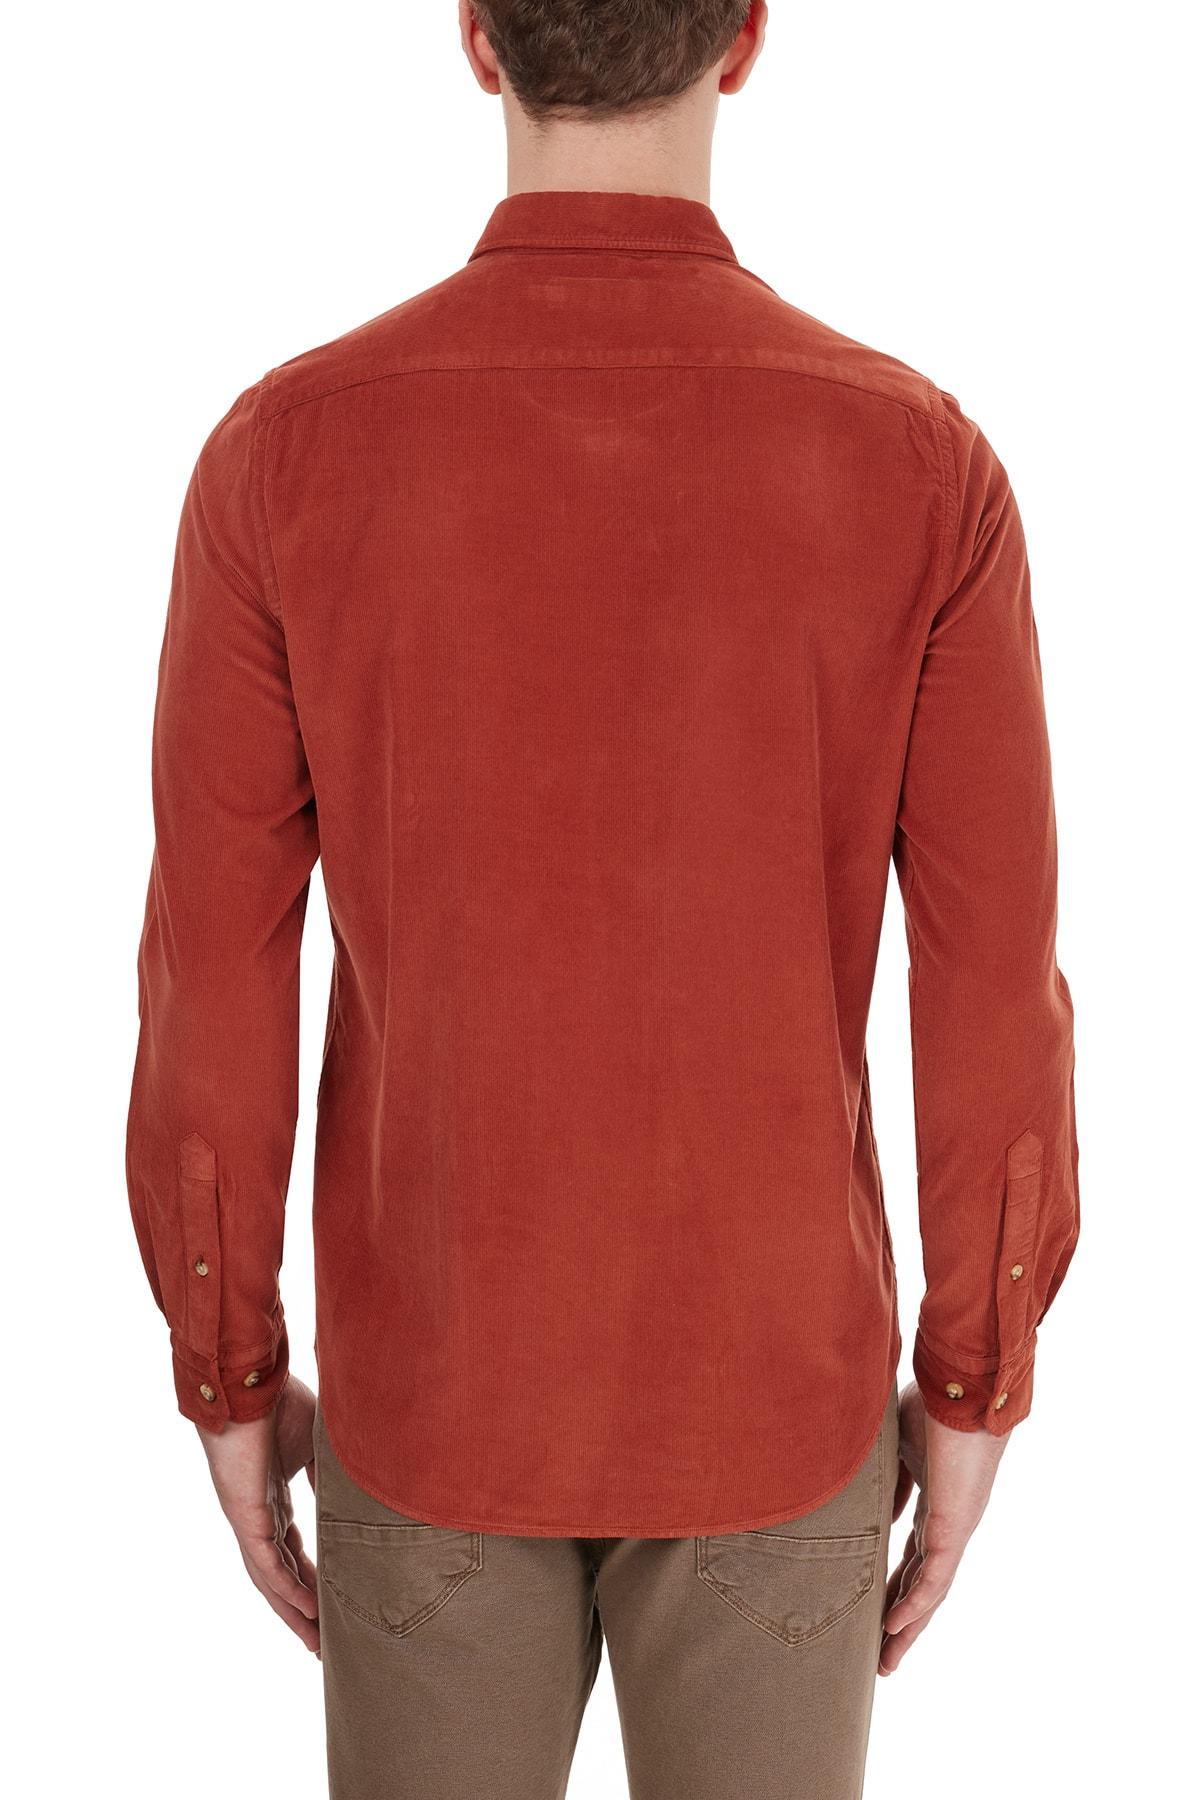 Ruck & Maul Düz Yaka % 100 Pamuk Gömlek Erkek Gömlek Ba1m0200071 21184 2